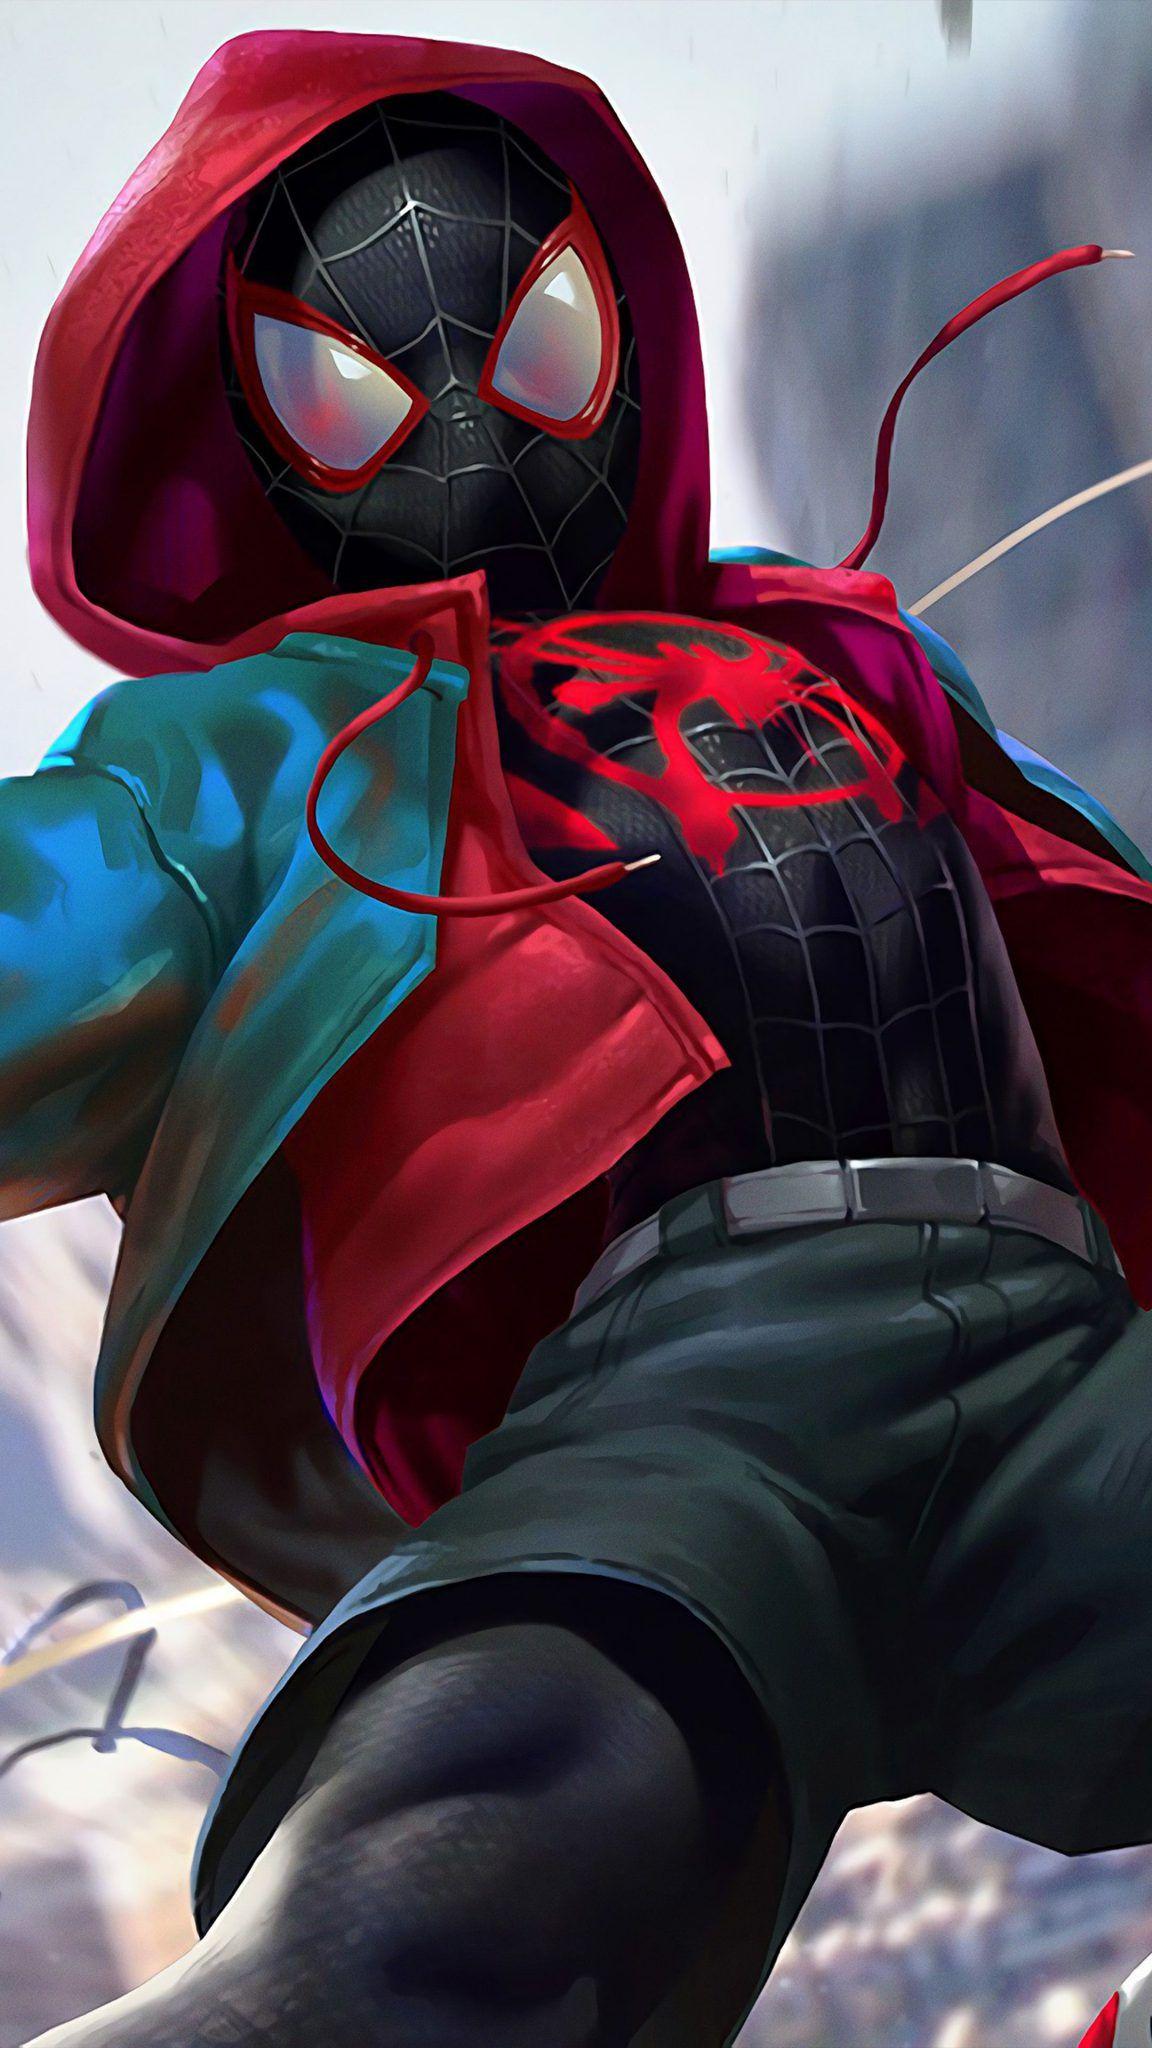 Iphone X Wallpaper Screensaver Background 142 Spiderman 4k Ultra Hd